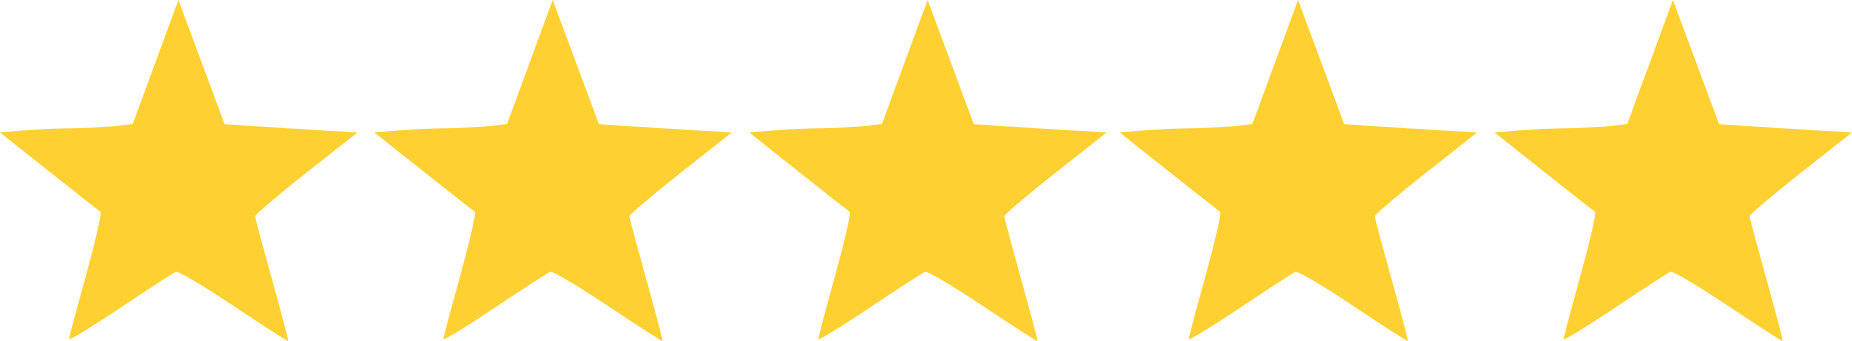 feefo-stars